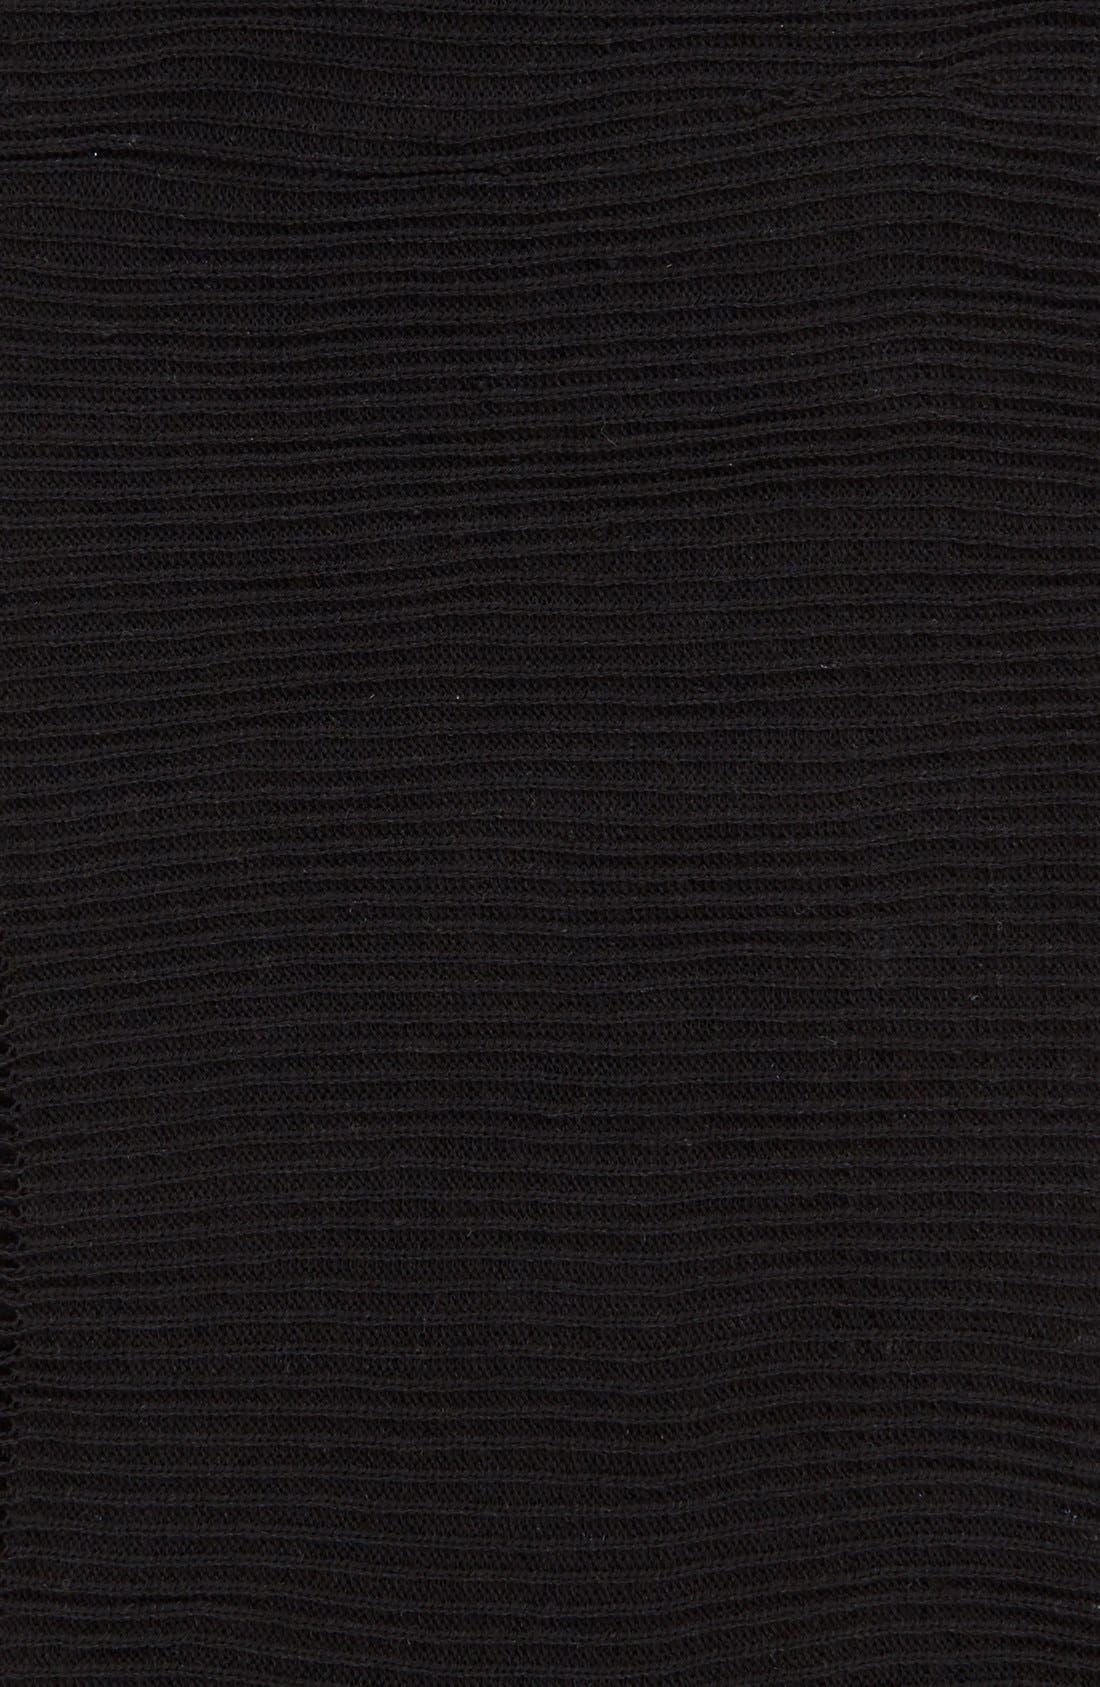 BP., Rib Knit Fringe Infinity Scarf, Alternate thumbnail 2, color, 001